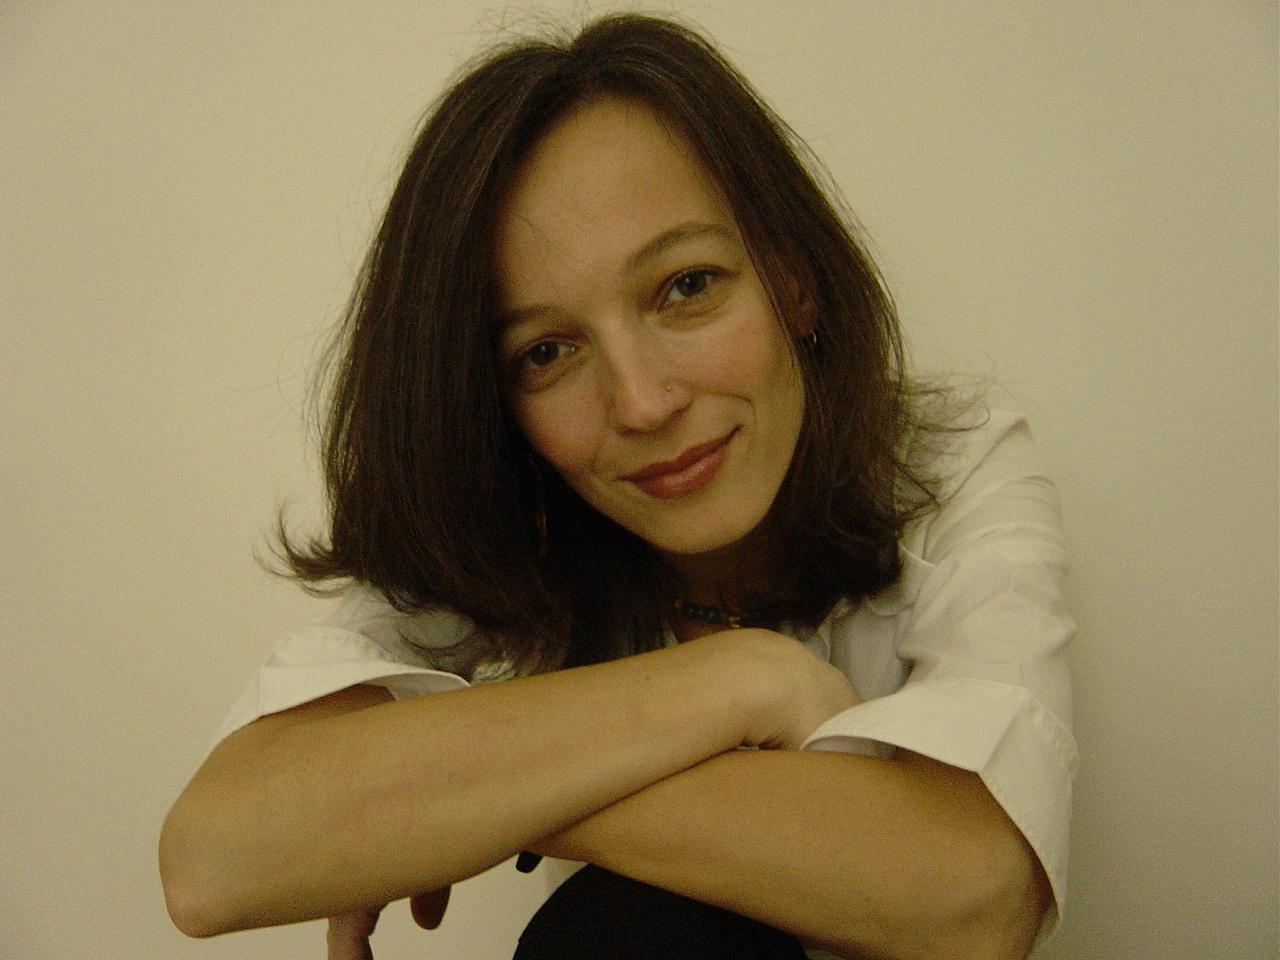 Martina Schobersberger